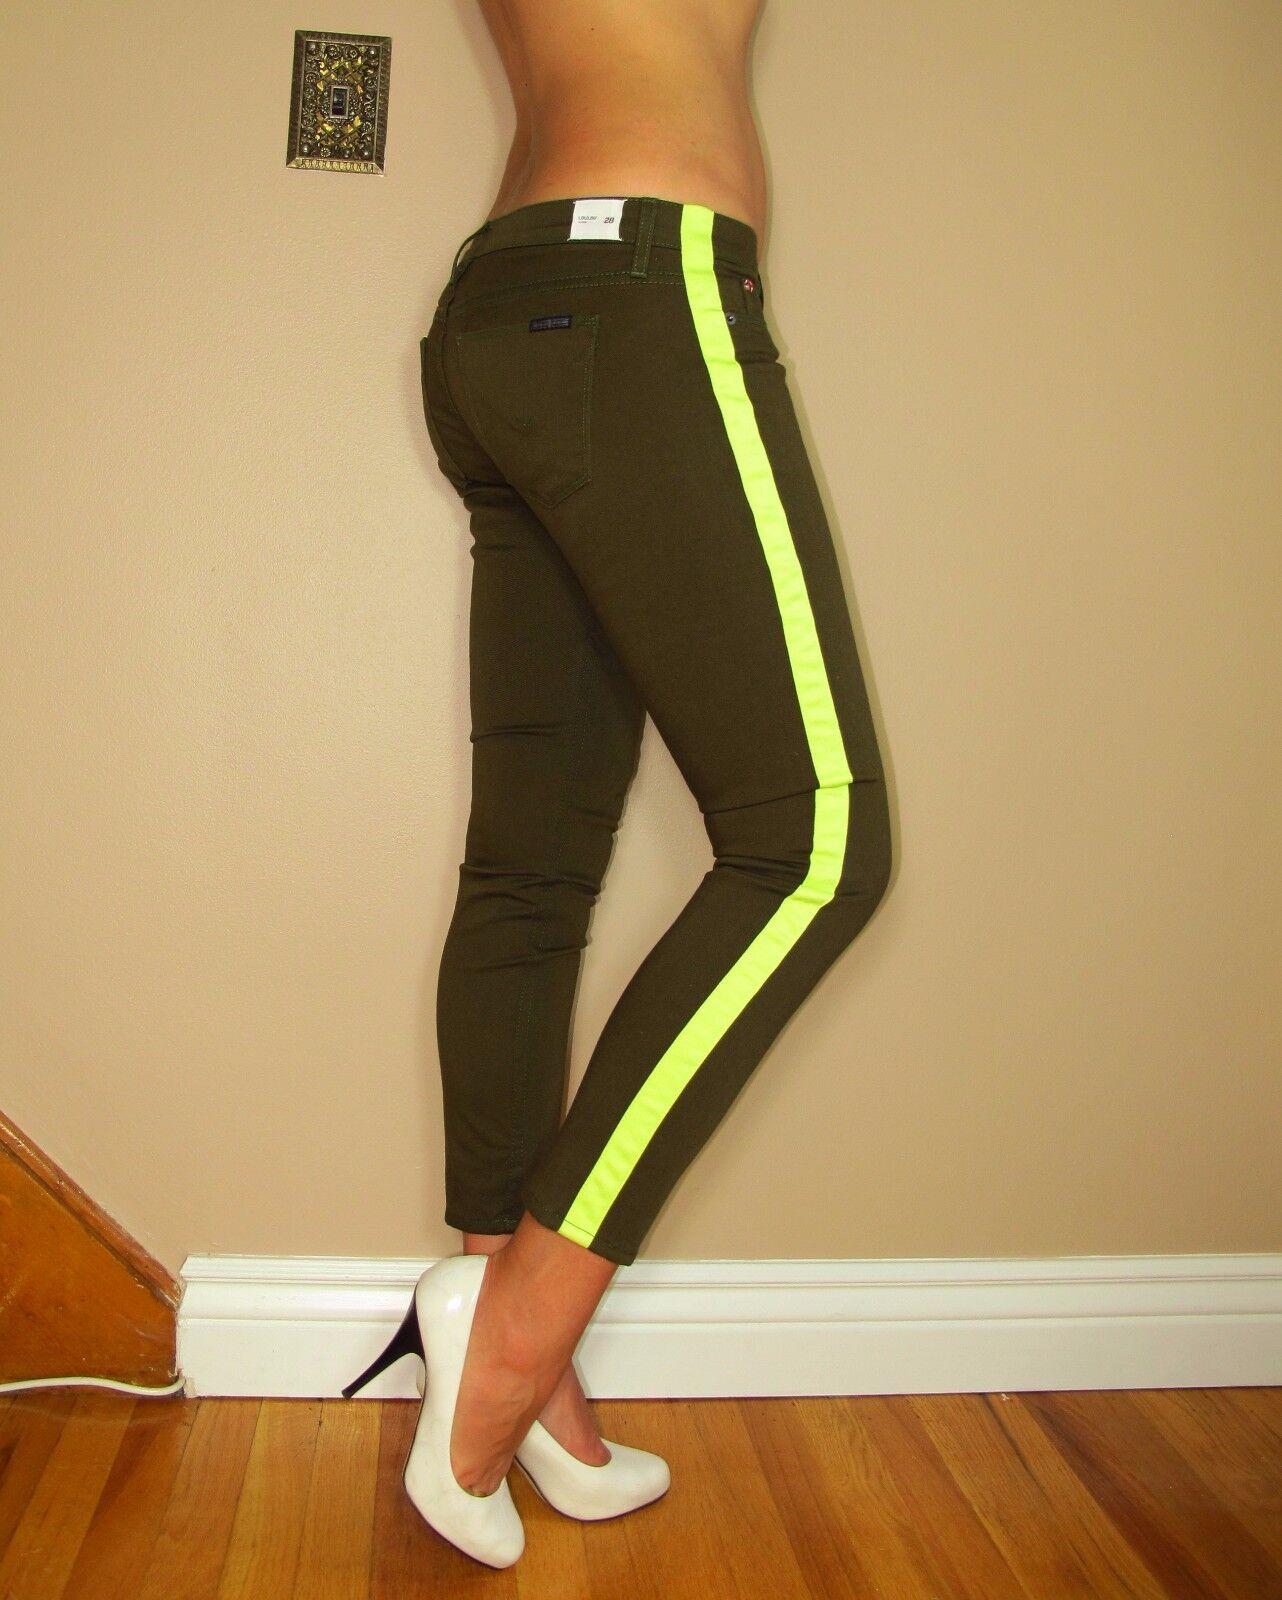 Hudson  187 Loulou Chopin Neon Dark Olive Army Green Tuxedo Skinny Jeans 28 NWT